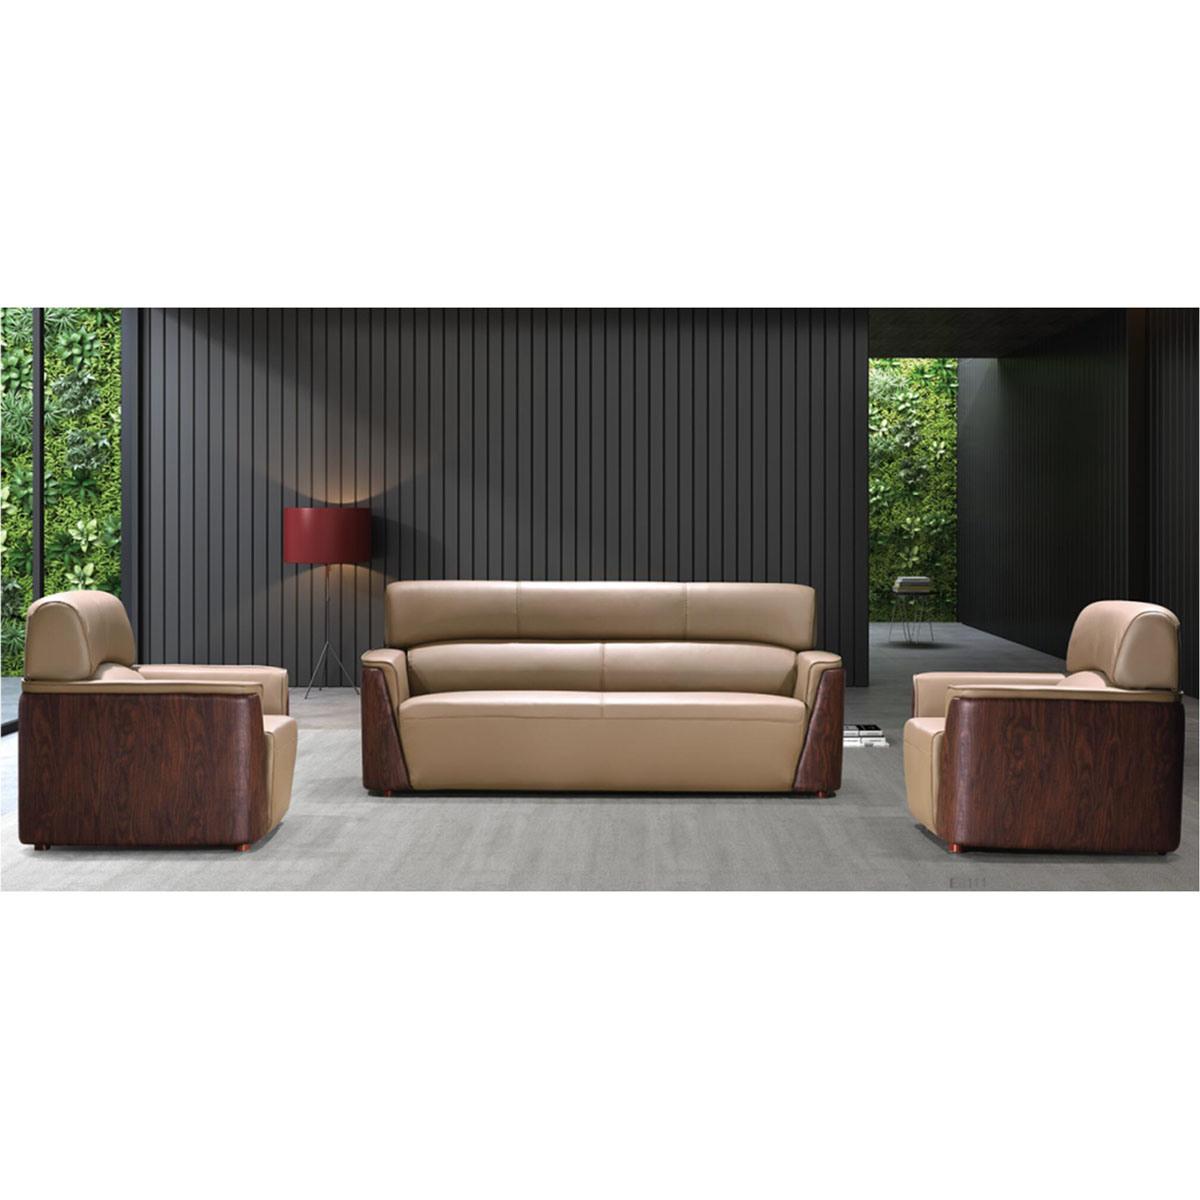 China Foshan Office Furniture Modern Leather Office/Hotel Sofa Design (SZ-SF838) - China Office Sofa, Cheap Sofa